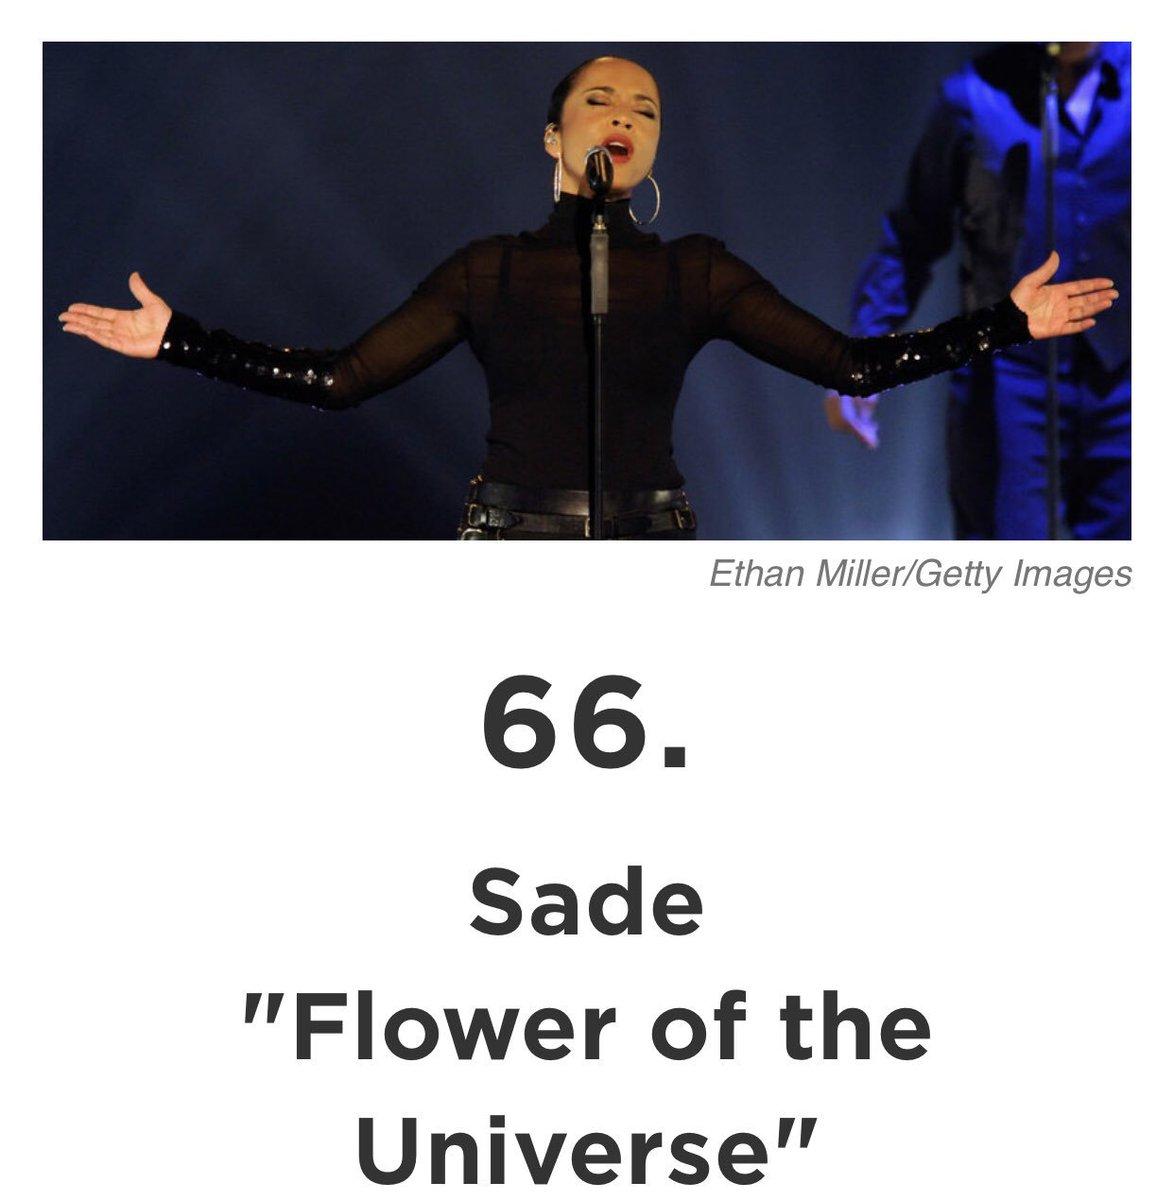 The 100 Best Songs Of 2018 #FlowerOfTheUniverse by @SadeOfficial 🌸 #WrinkleInTime npr.org/2018/12/05/671…